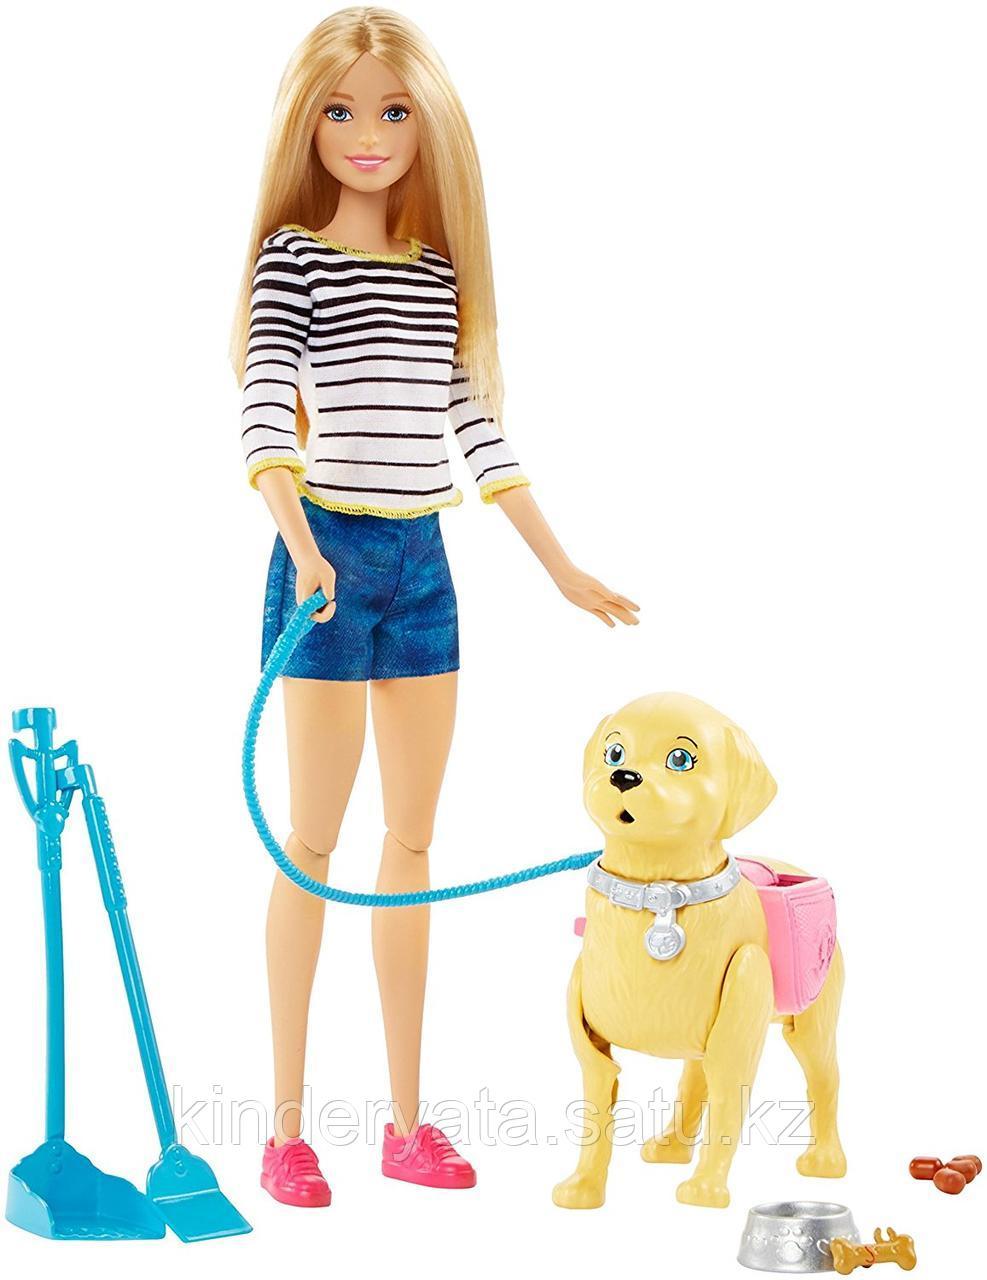 Кукла Барби Barbie Прогулка с щенком